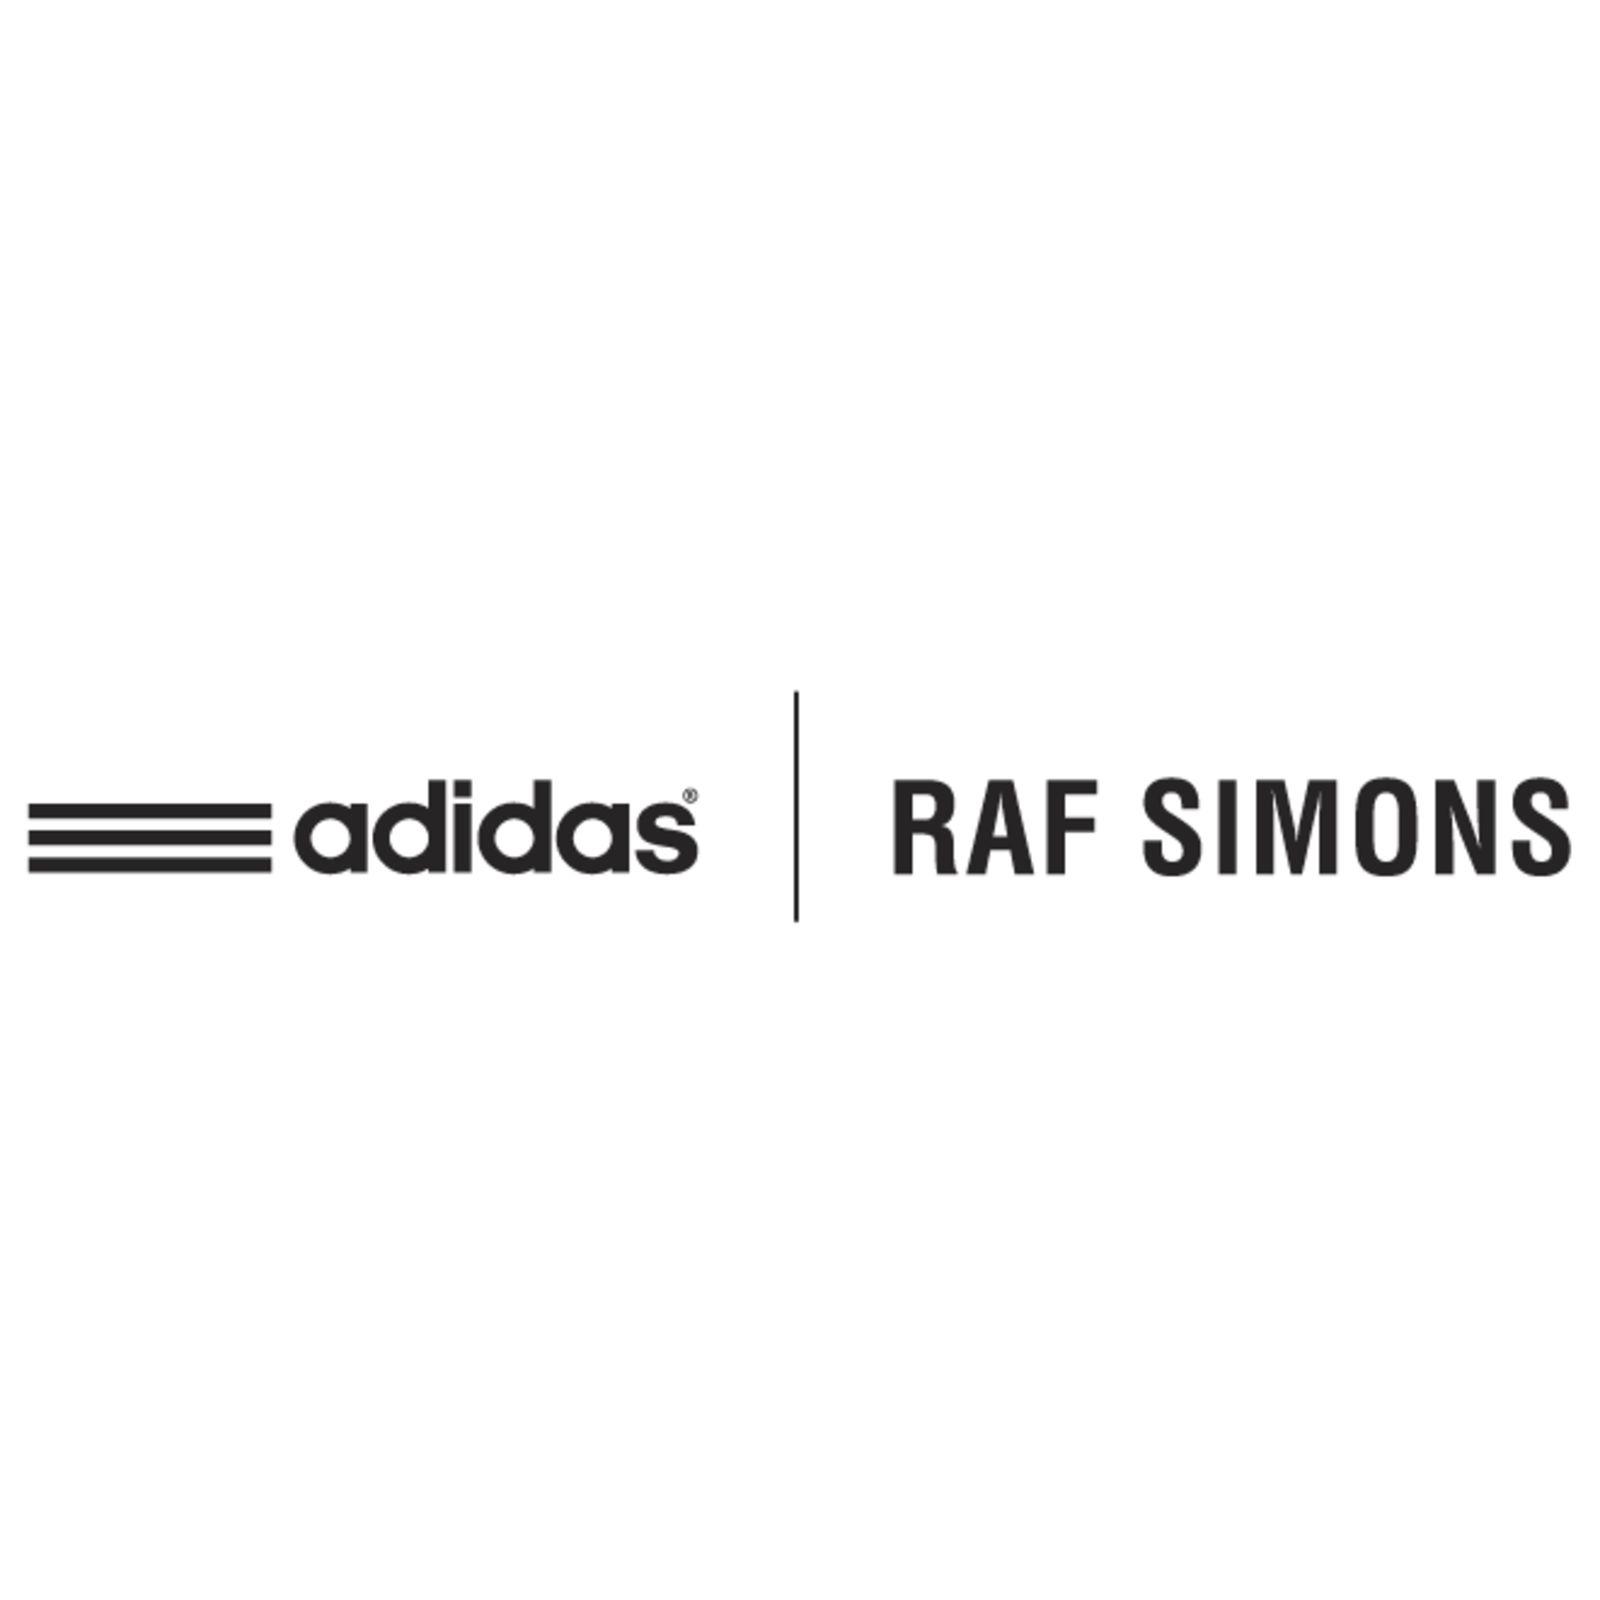 adidas x RAF SIMONS (Bild 1)